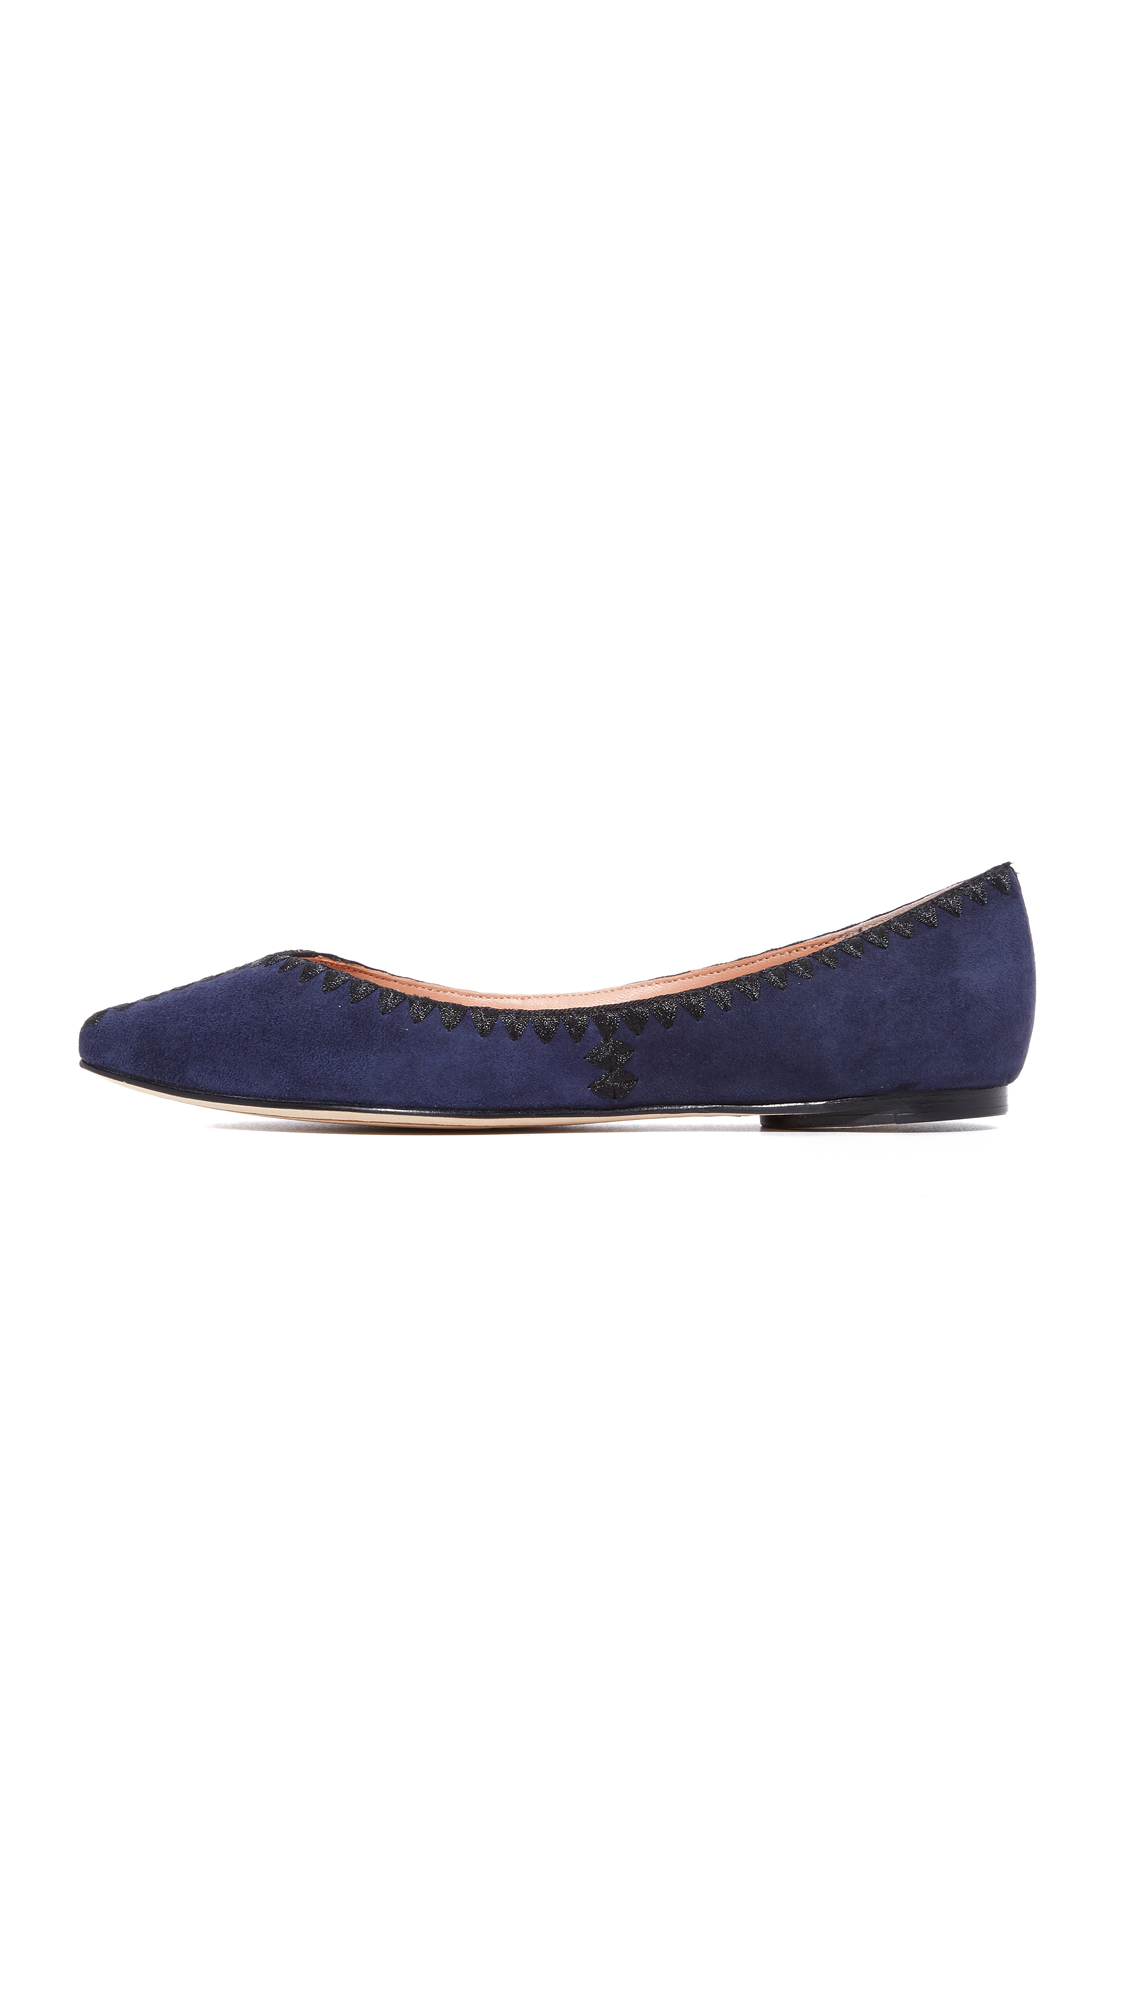 3ff7f7480 Sigerson Morrison Vinal Ballet Flats | SHOPBOP